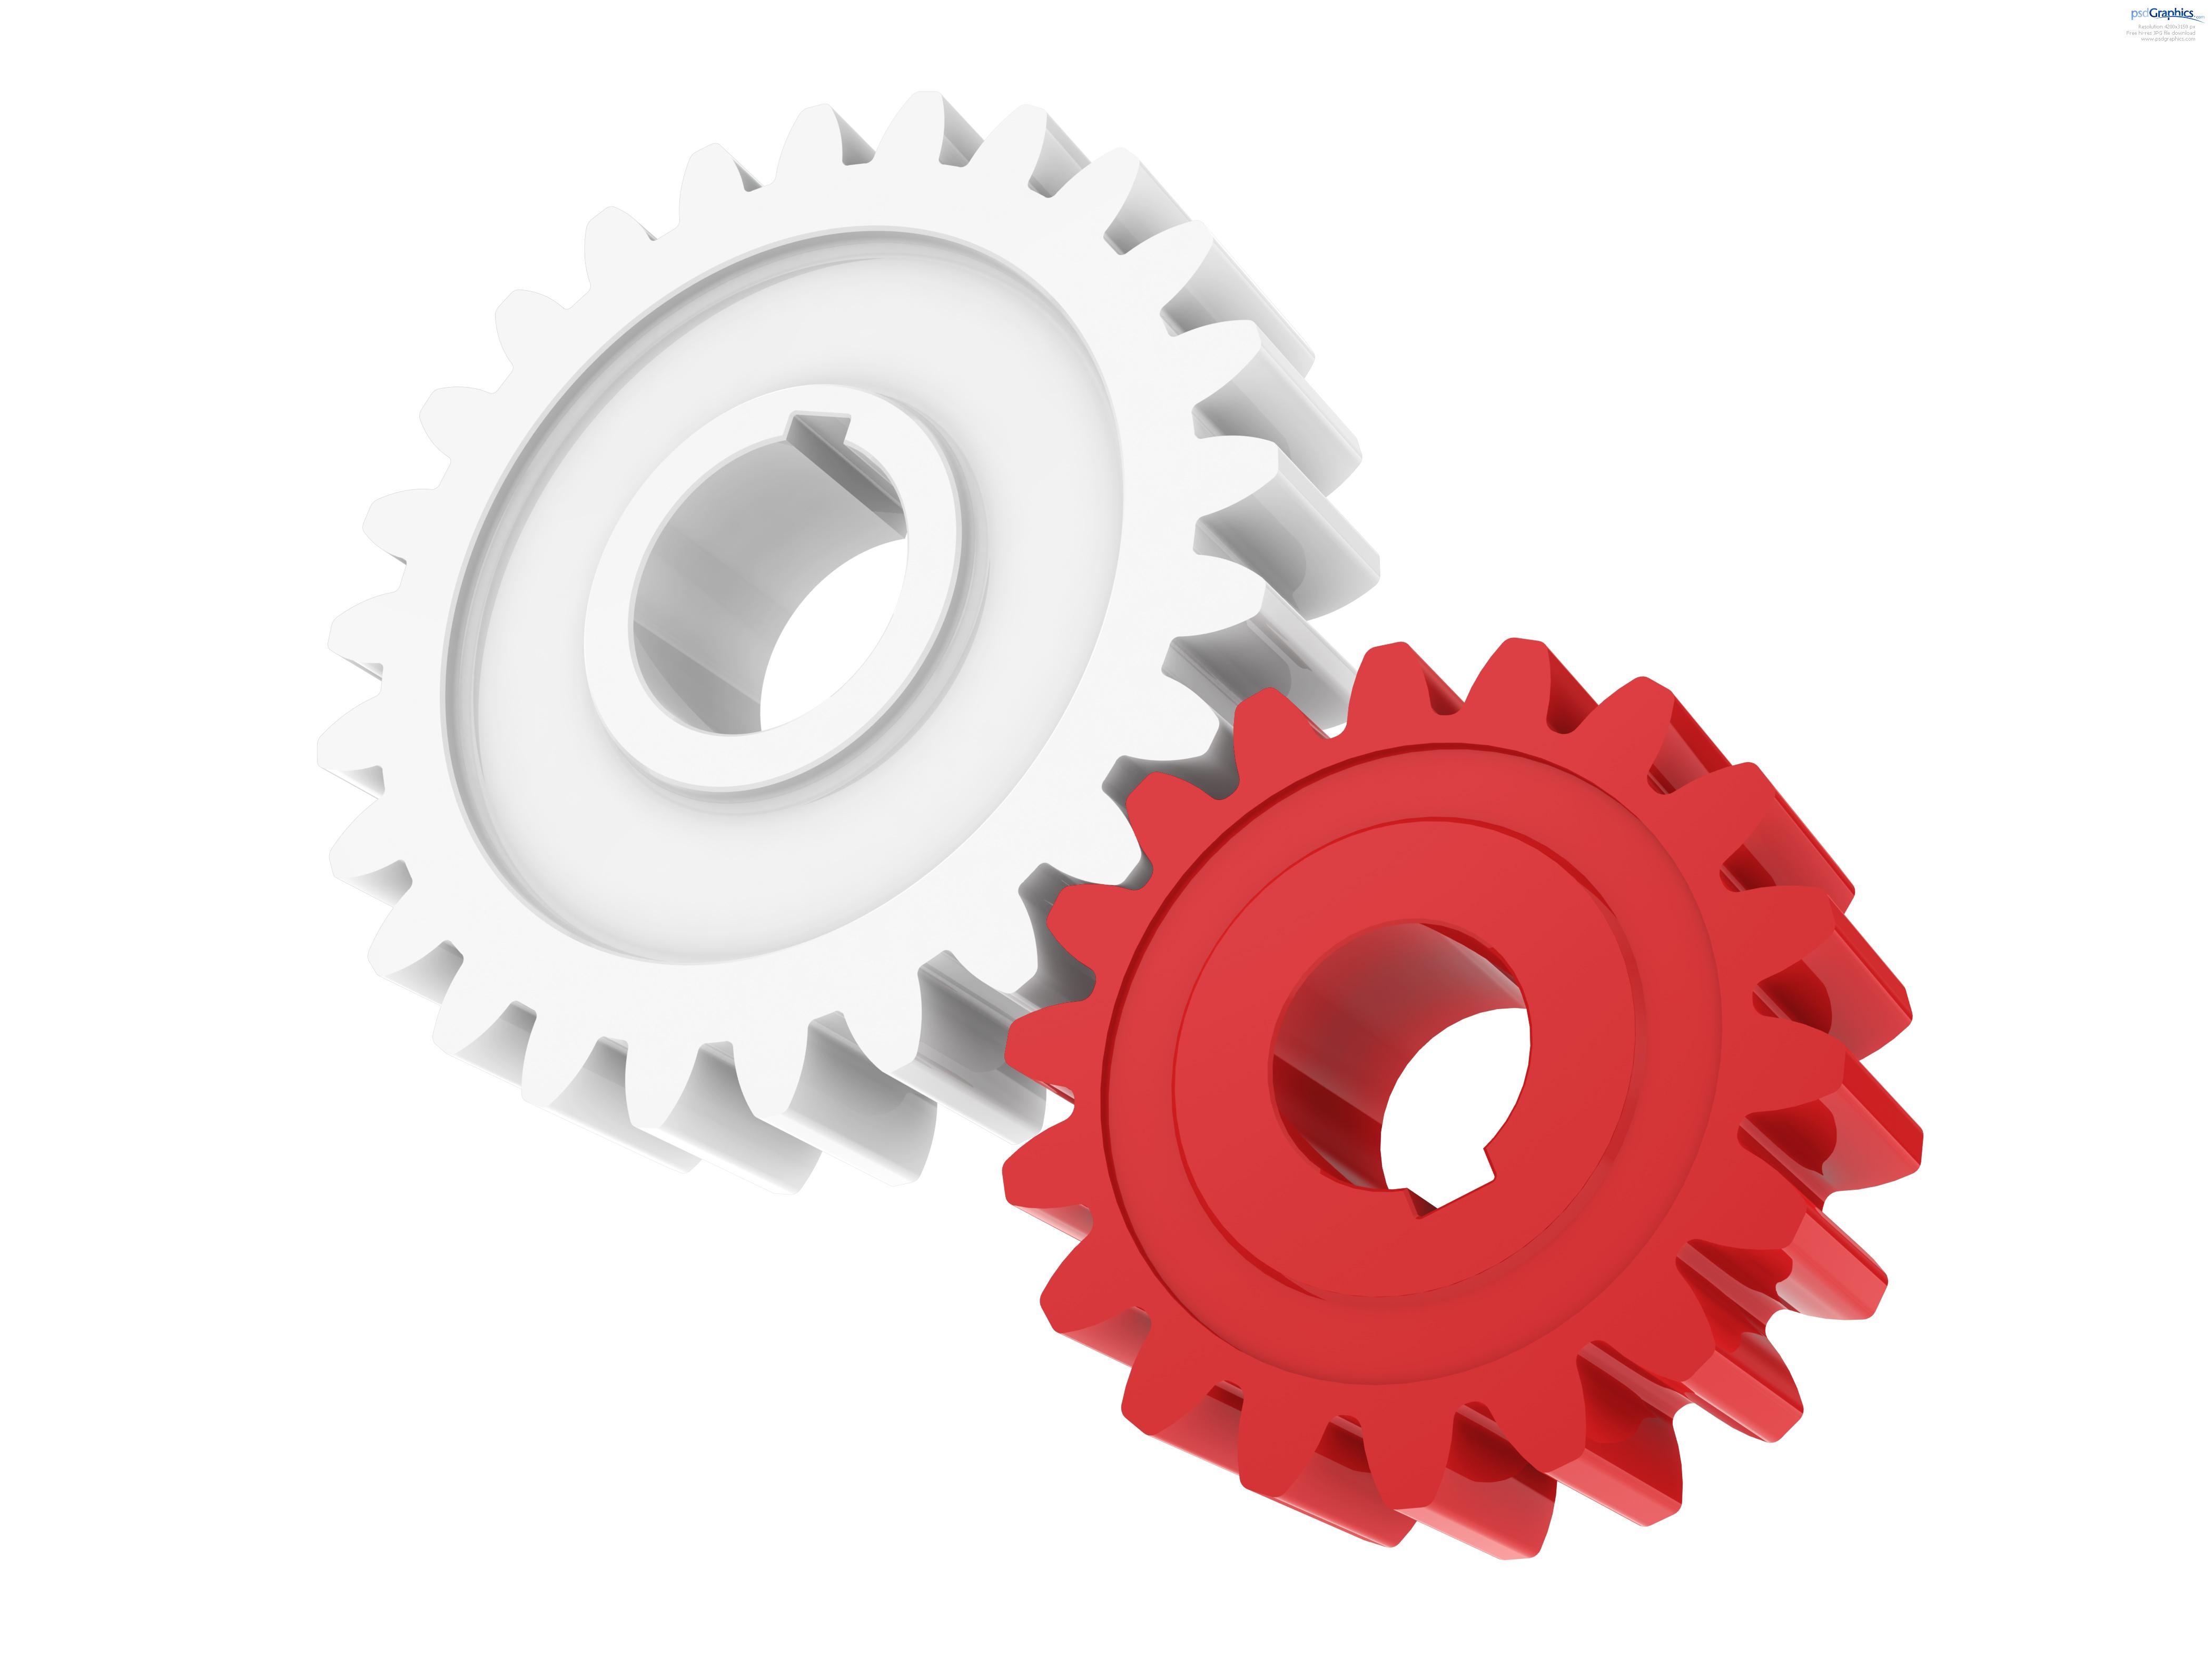 Gears clipart 3d gear Plastic gears success PSDGraphics gears